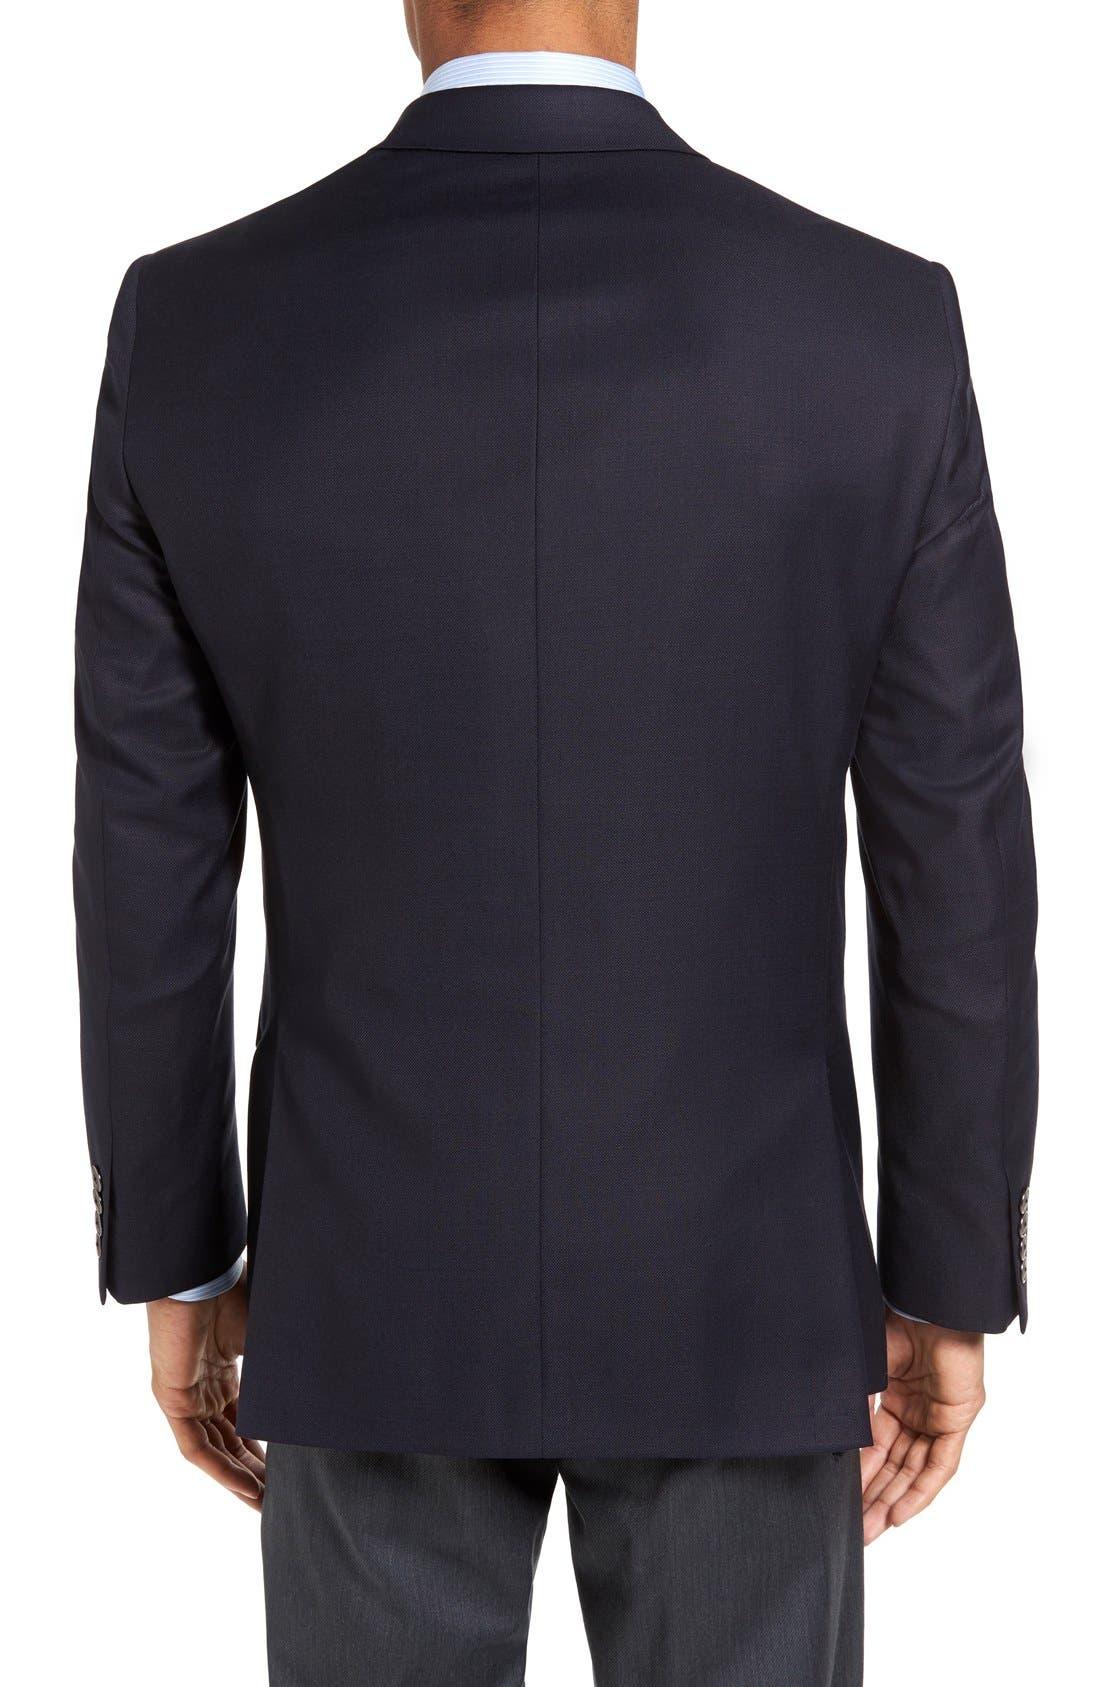 New York Classic Fit Wool Blend Blazer,                             Alternate thumbnail 5, color,                             NAVY